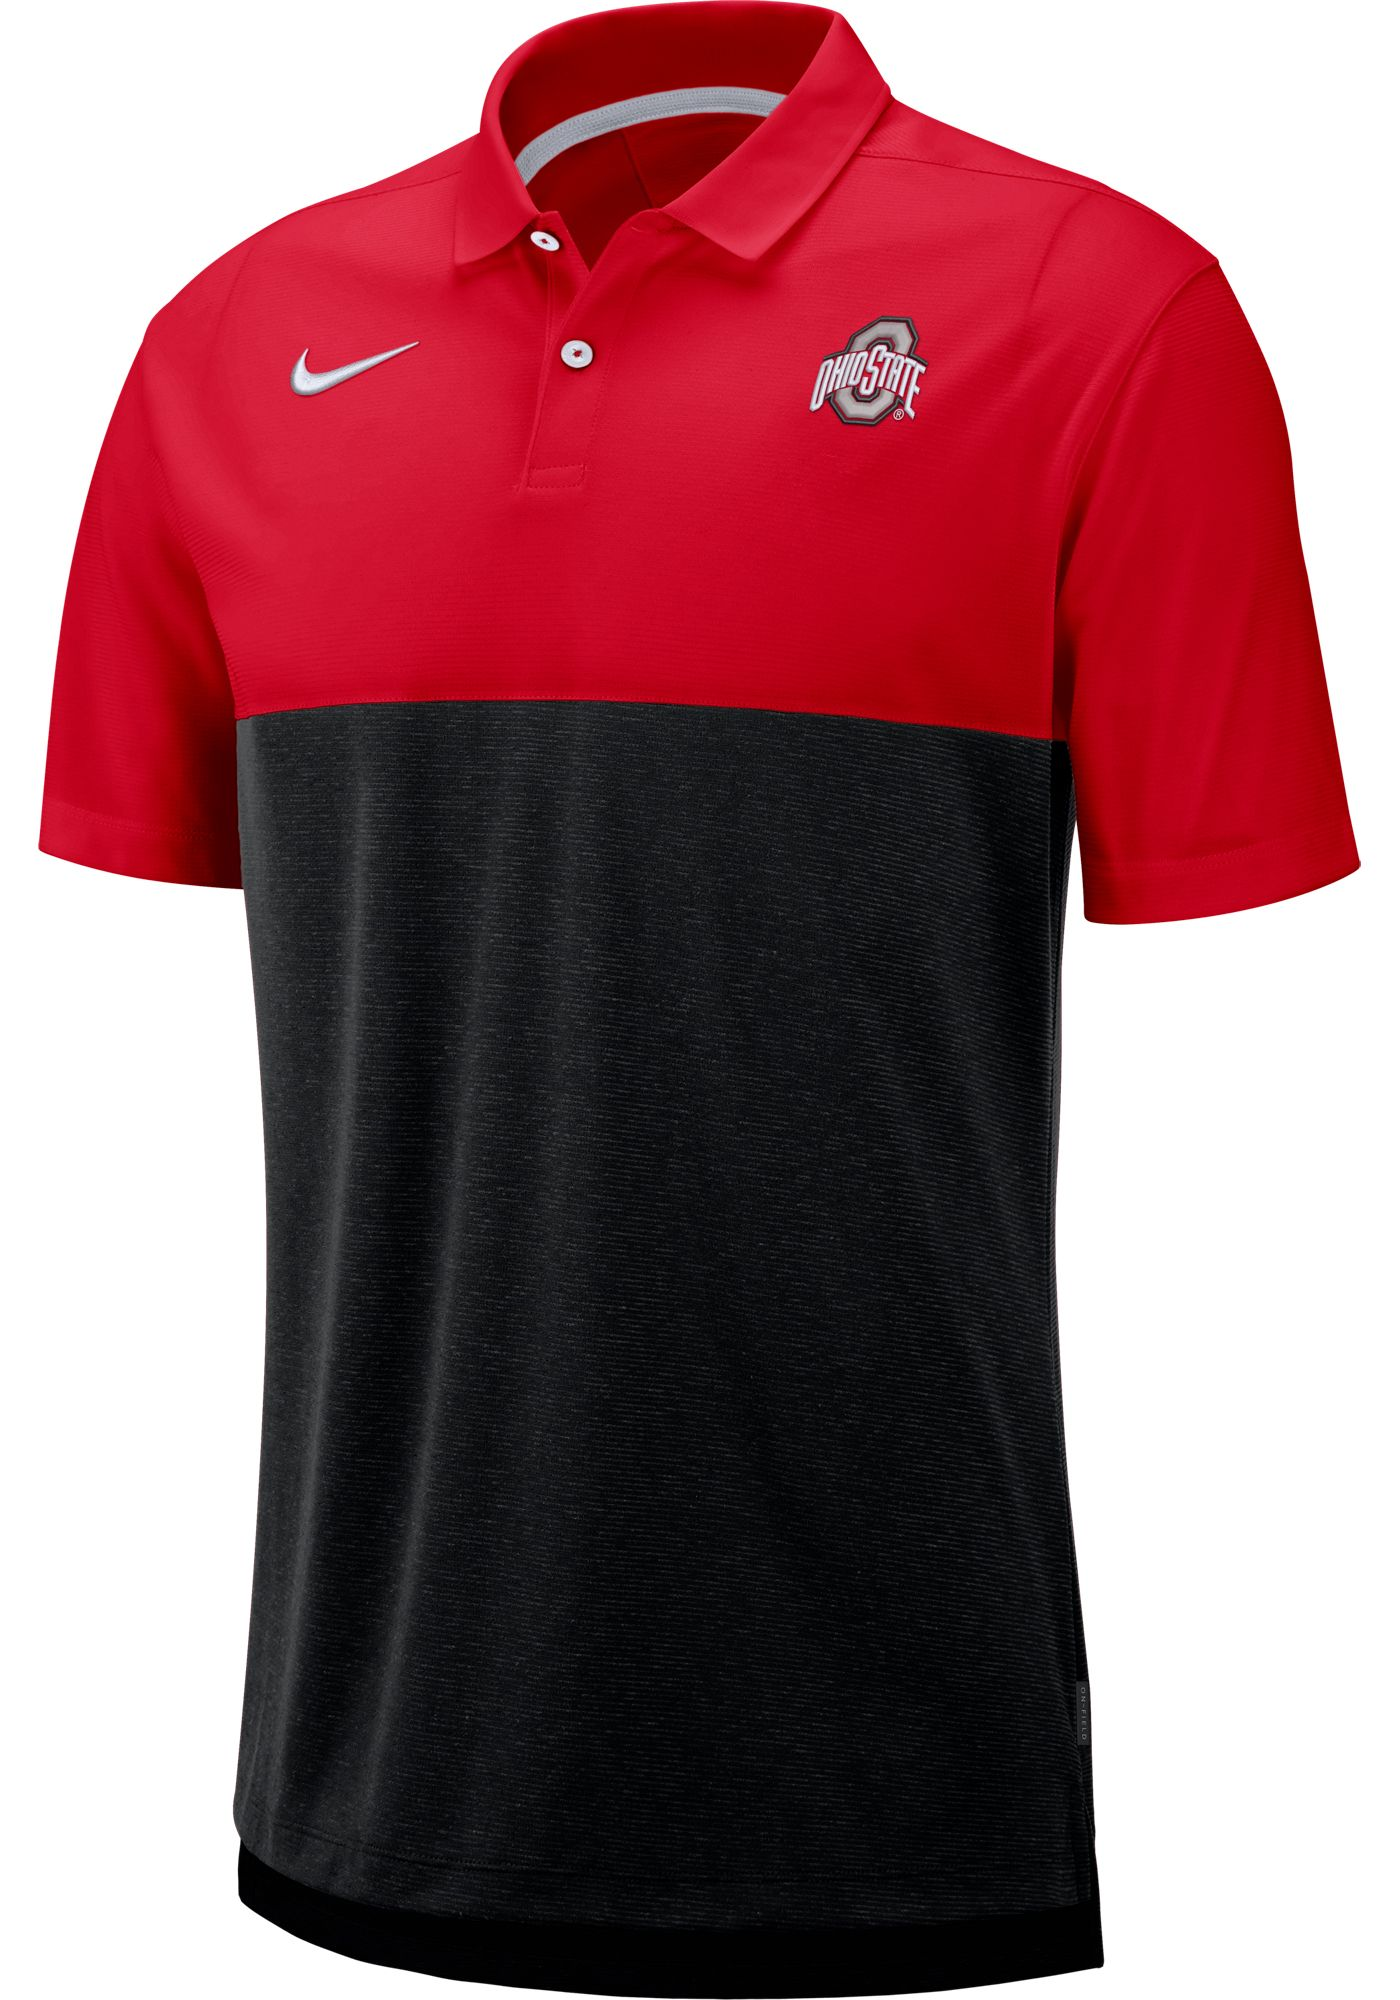 Nike Men's Ohio State Buckeyes Scarlet/Black Dri-FIT Breathe Football Sideline Polo